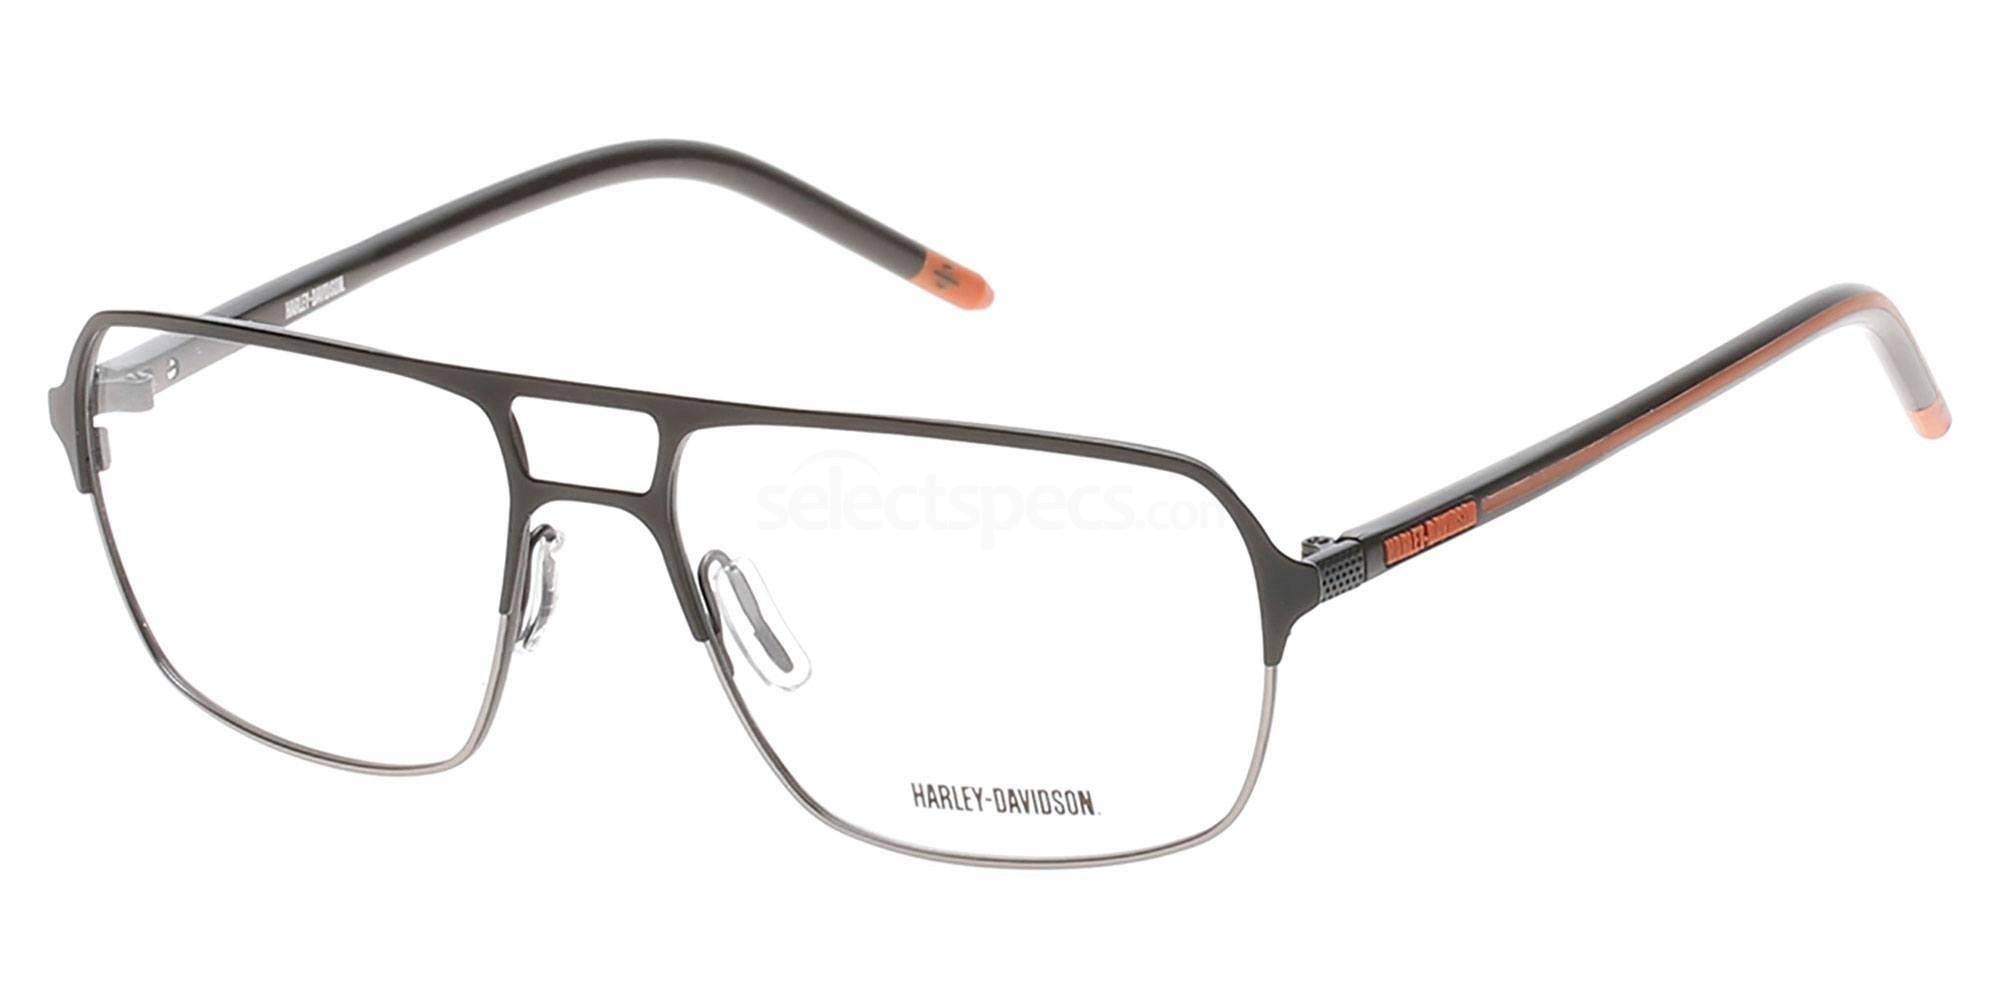 001 HD 1001 Glasses, Harley Davidson